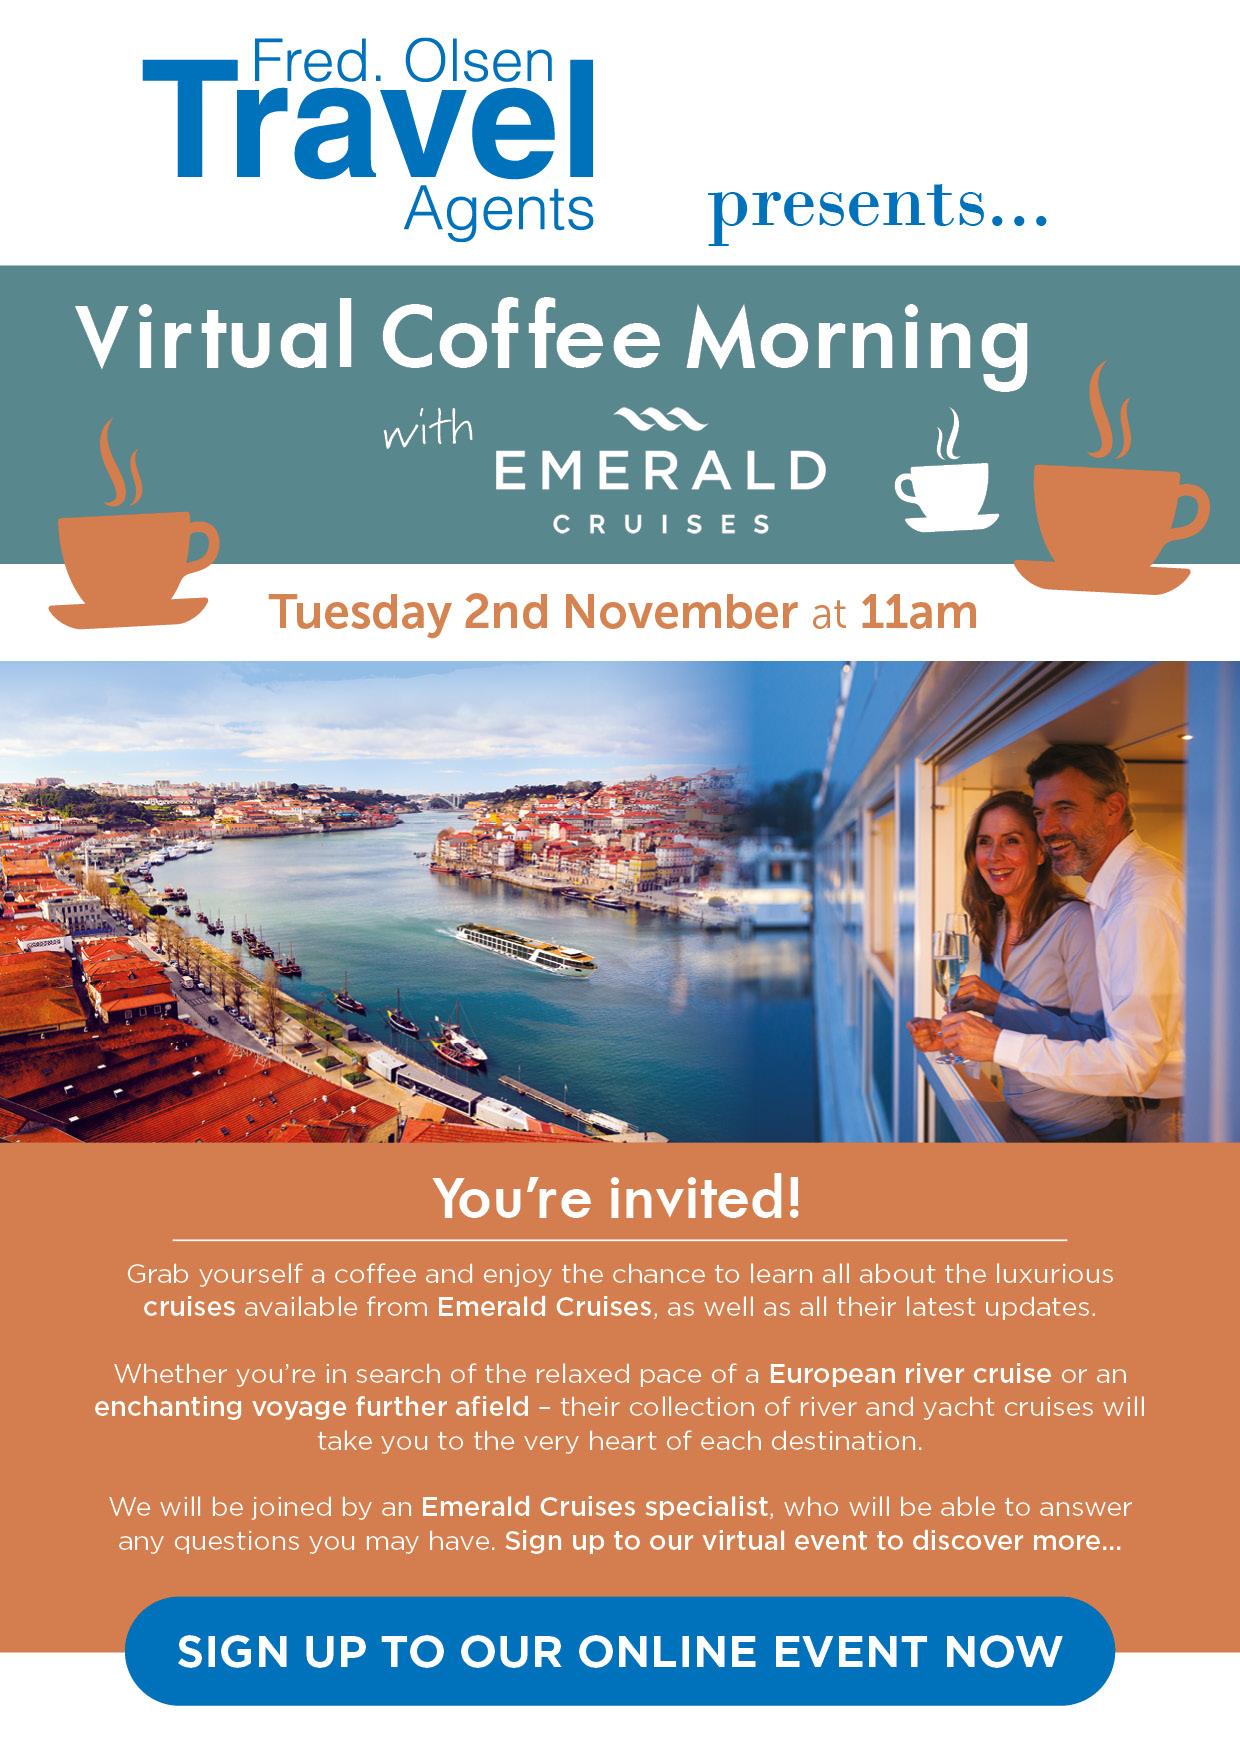 Virtual Coffee Morning with Emerald Cruises